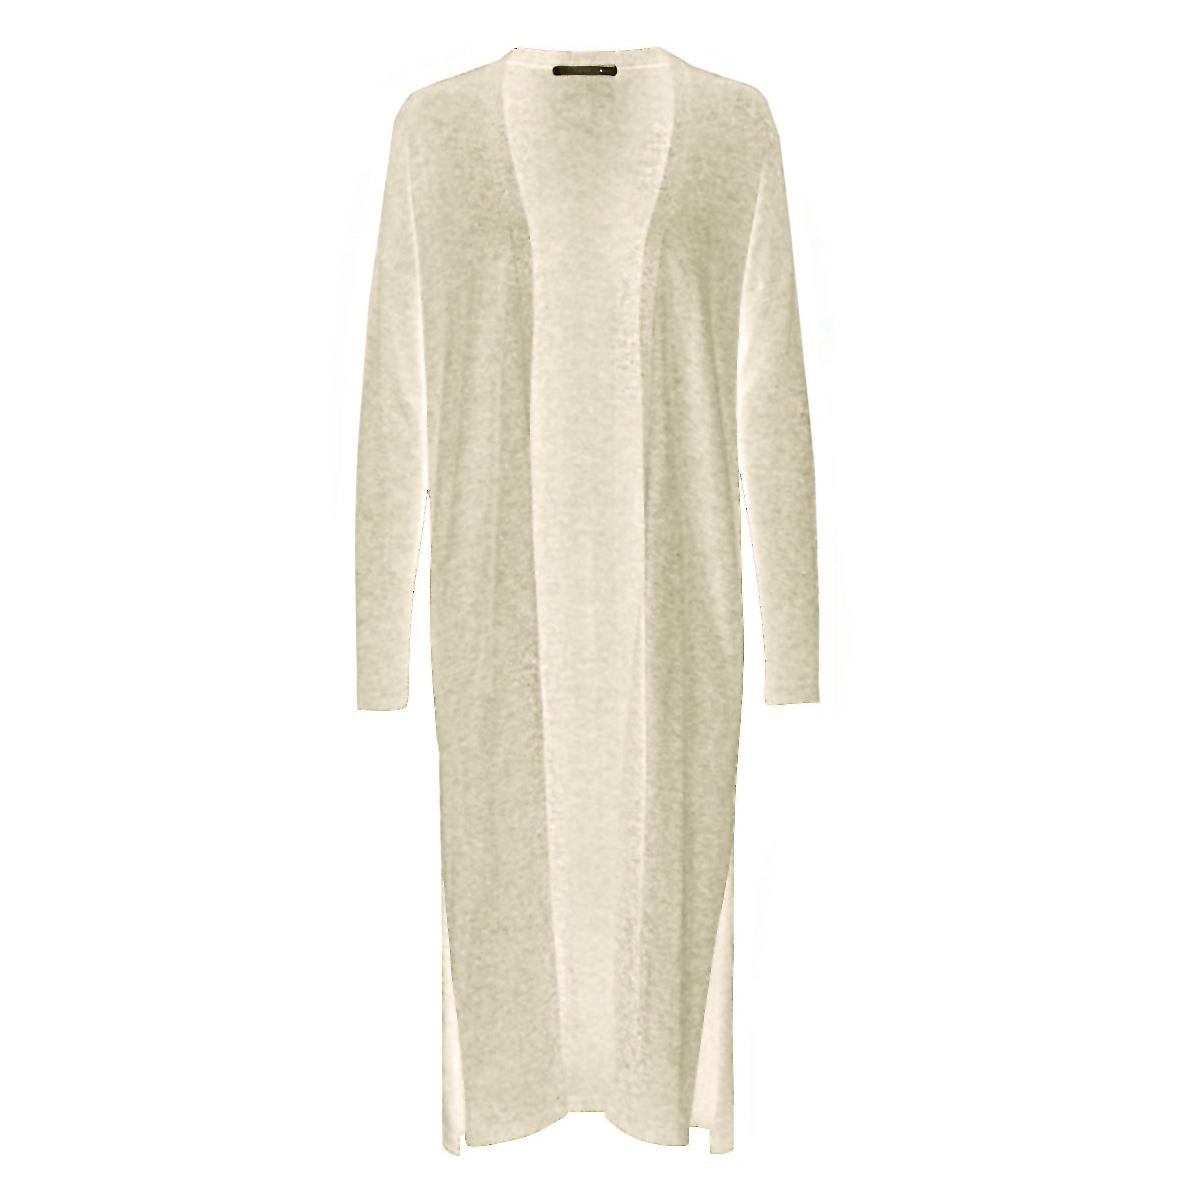 onlfrancis l/s long slit cardigan k 15119396 only vest frosted almon/w. melange